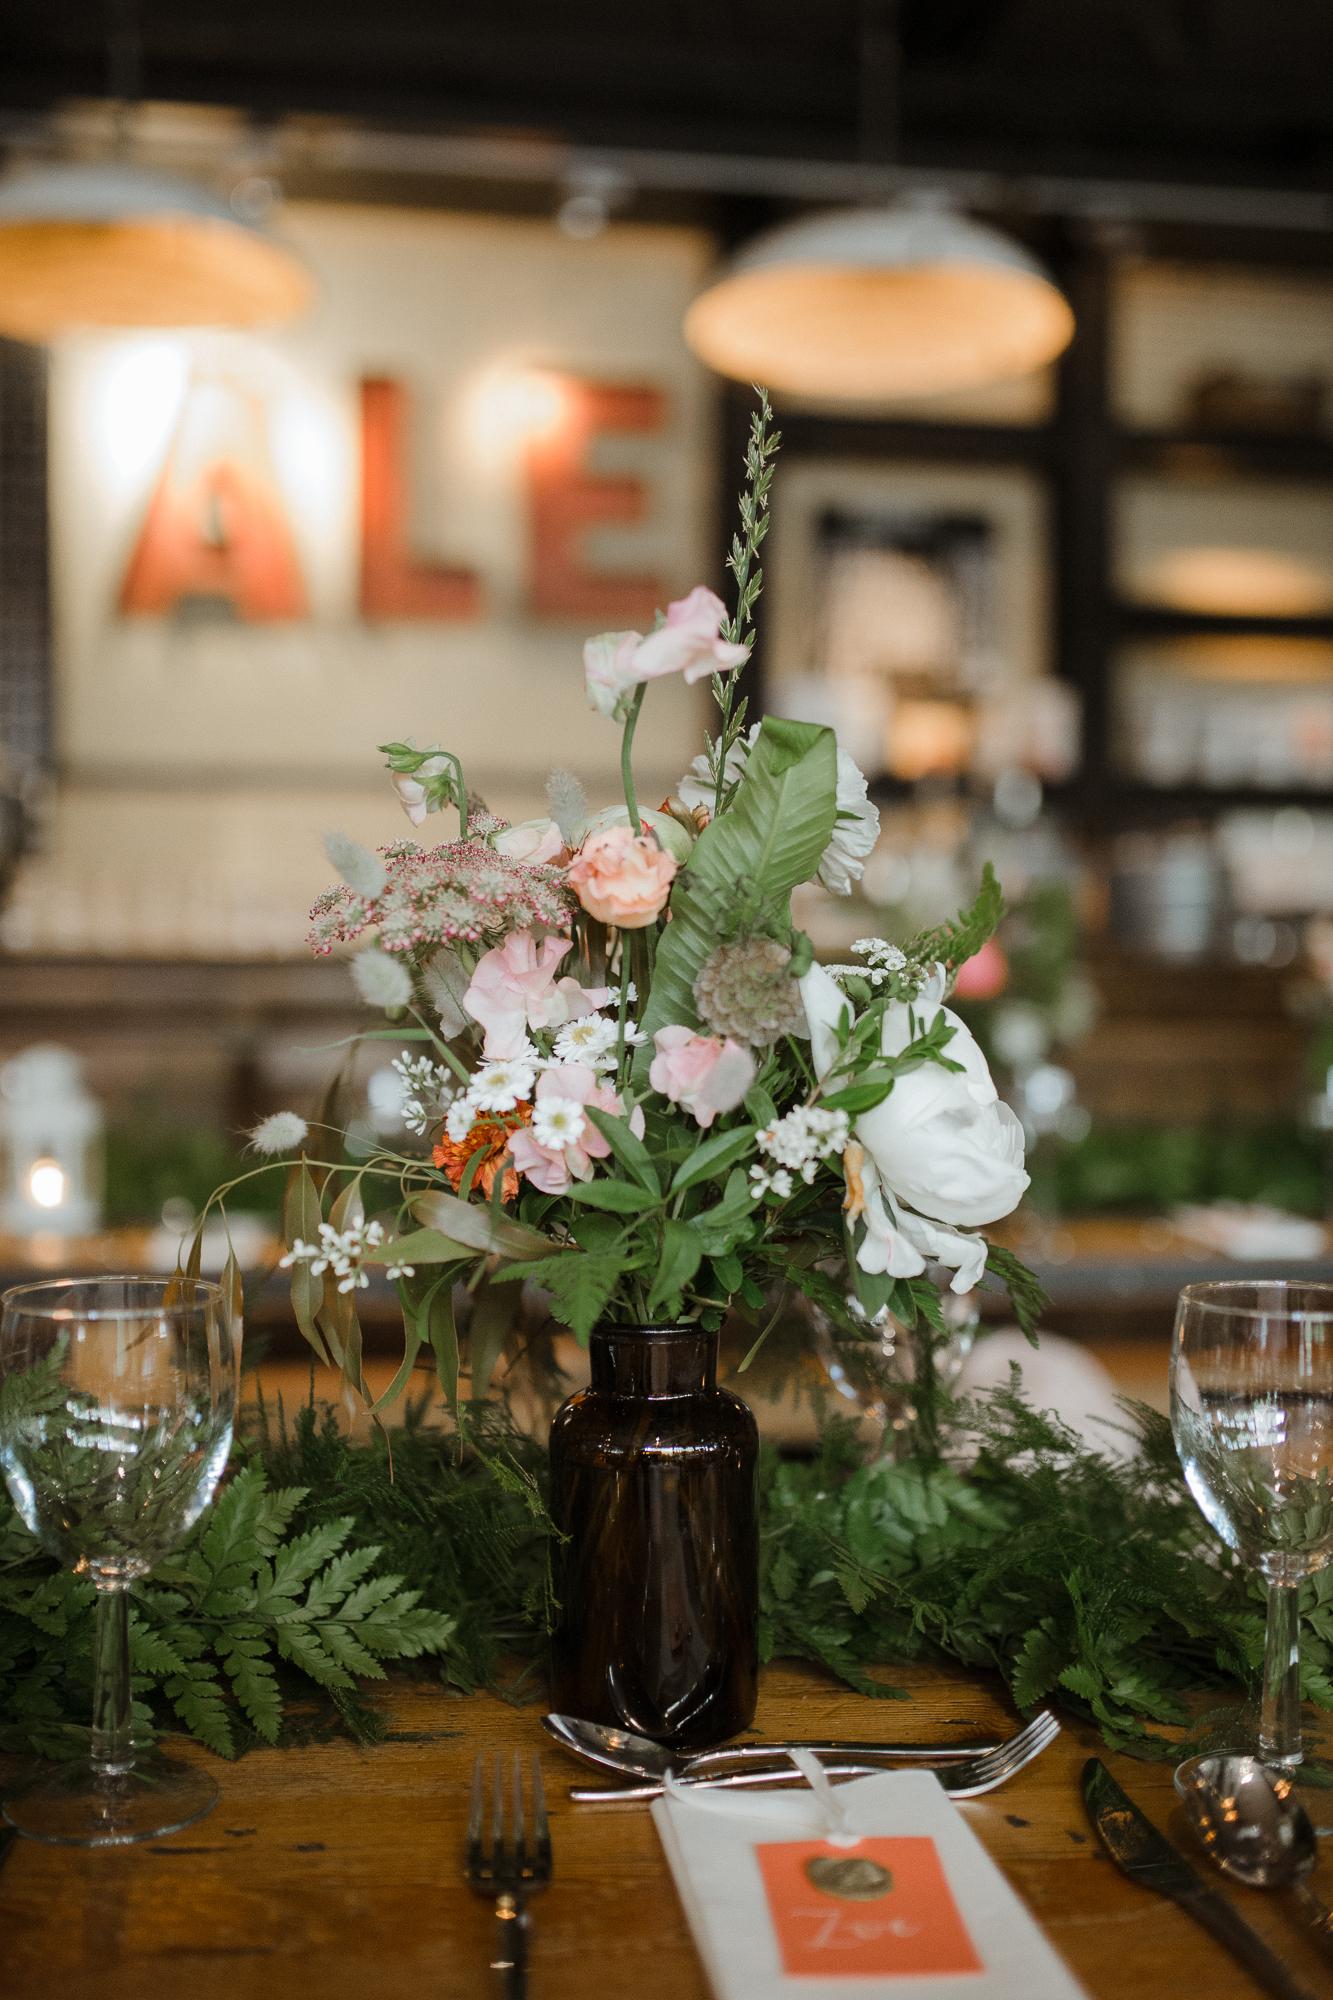 stephanie-green-wedding-photography-sulaflowers-sula-flowers-london-islington-town-hall-depot-n7-97.jpg